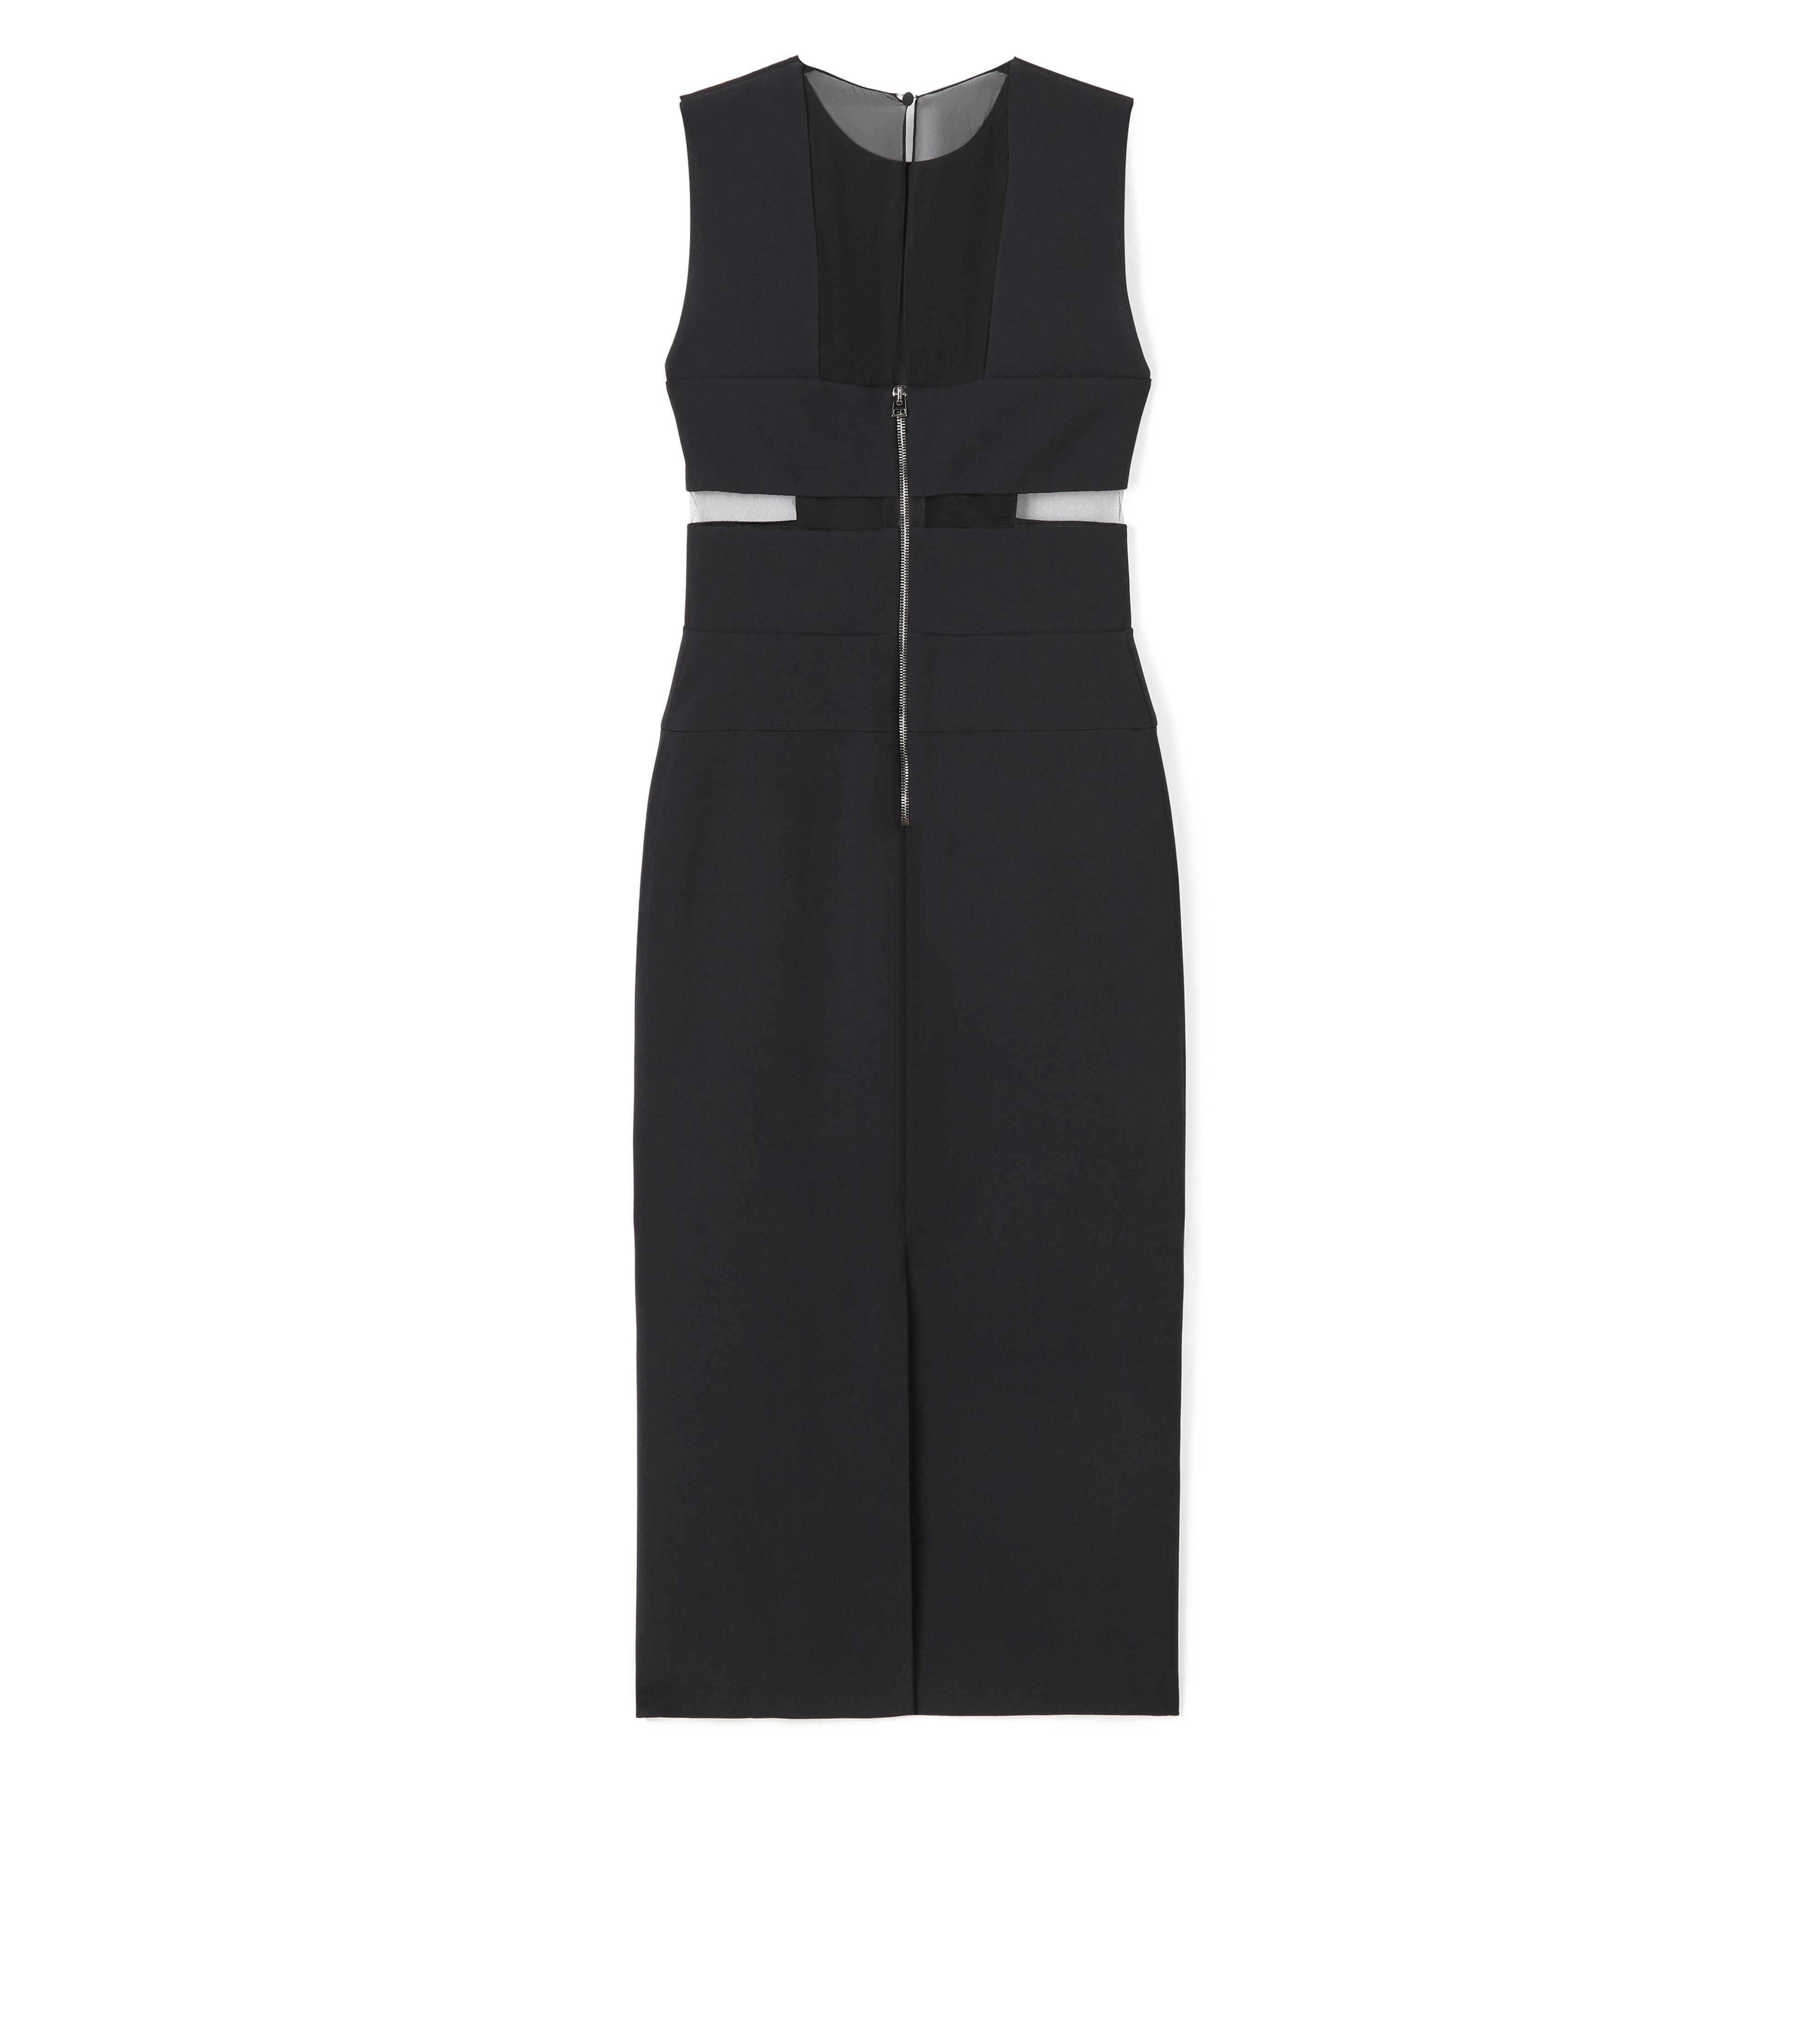 KNEE LENGTH SLEEVELESS DRESS WITH SHEER DETAILS B thumbnail